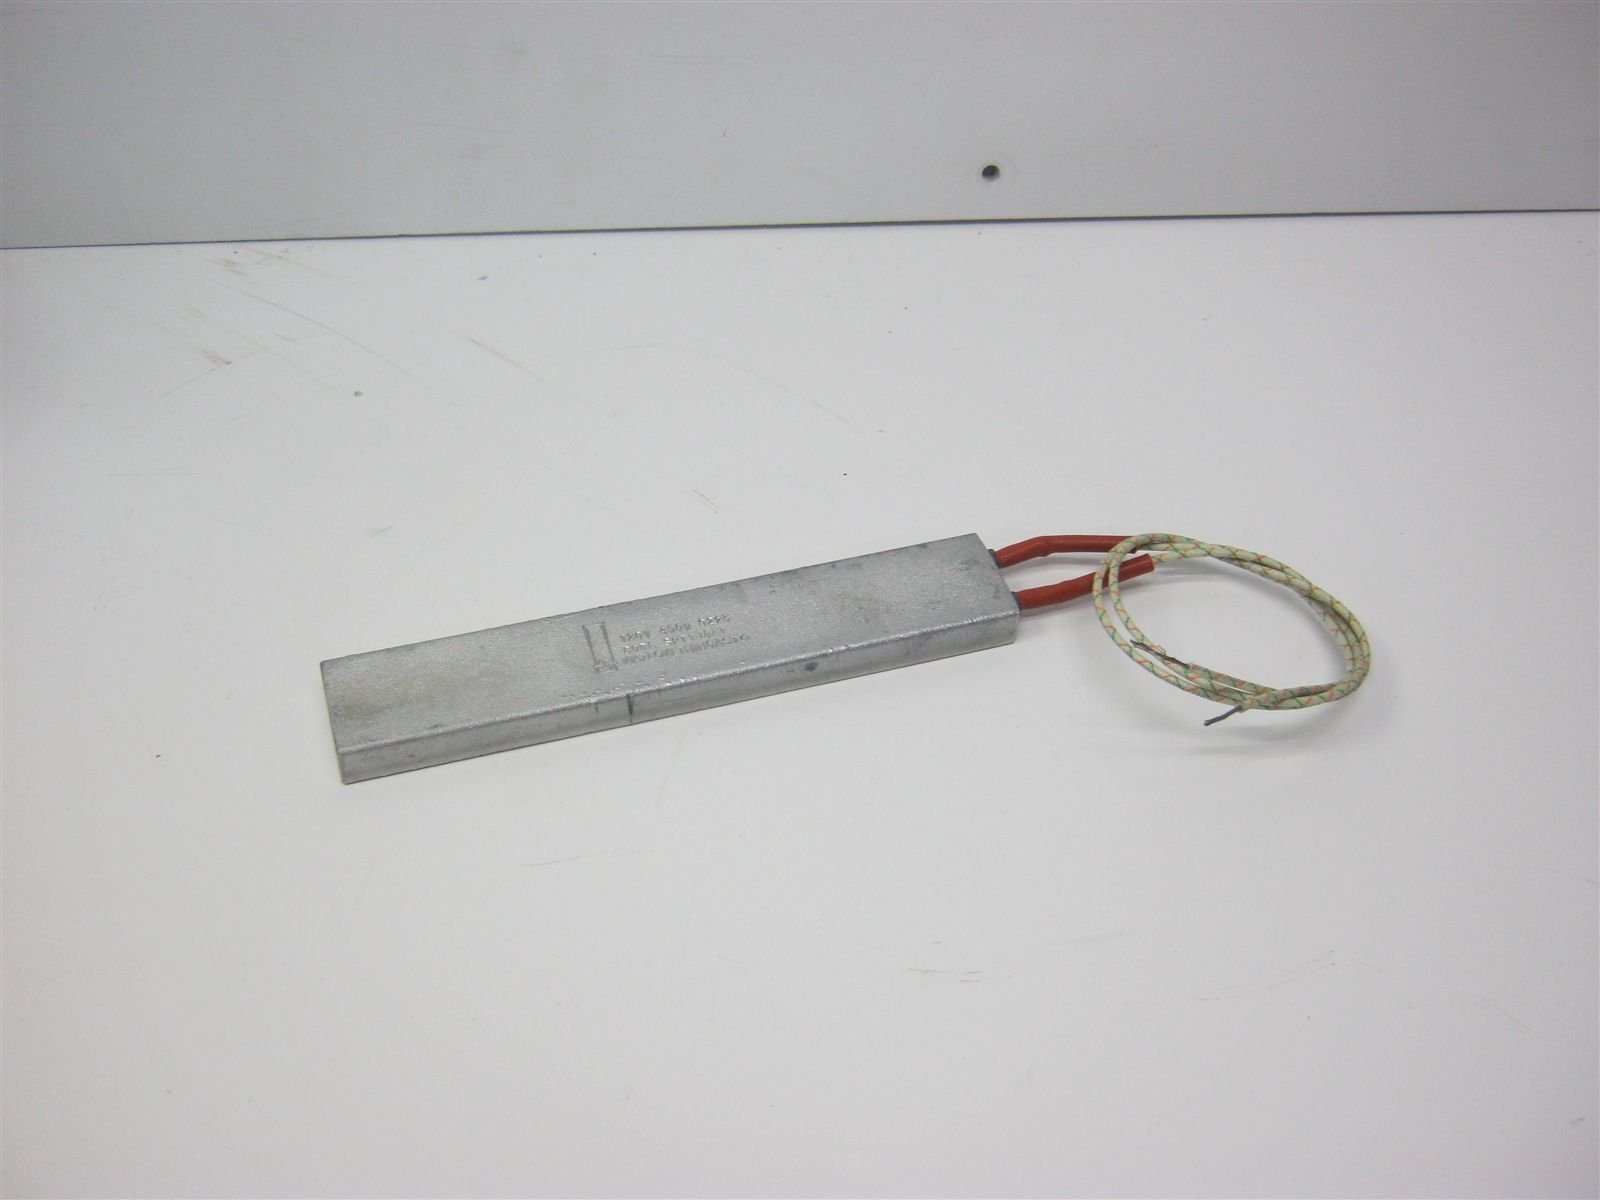 Watlow SPT1J8A1 ThinCast Aluminum Heater 120V 450W 8'' x 1.5'' x 0.5''